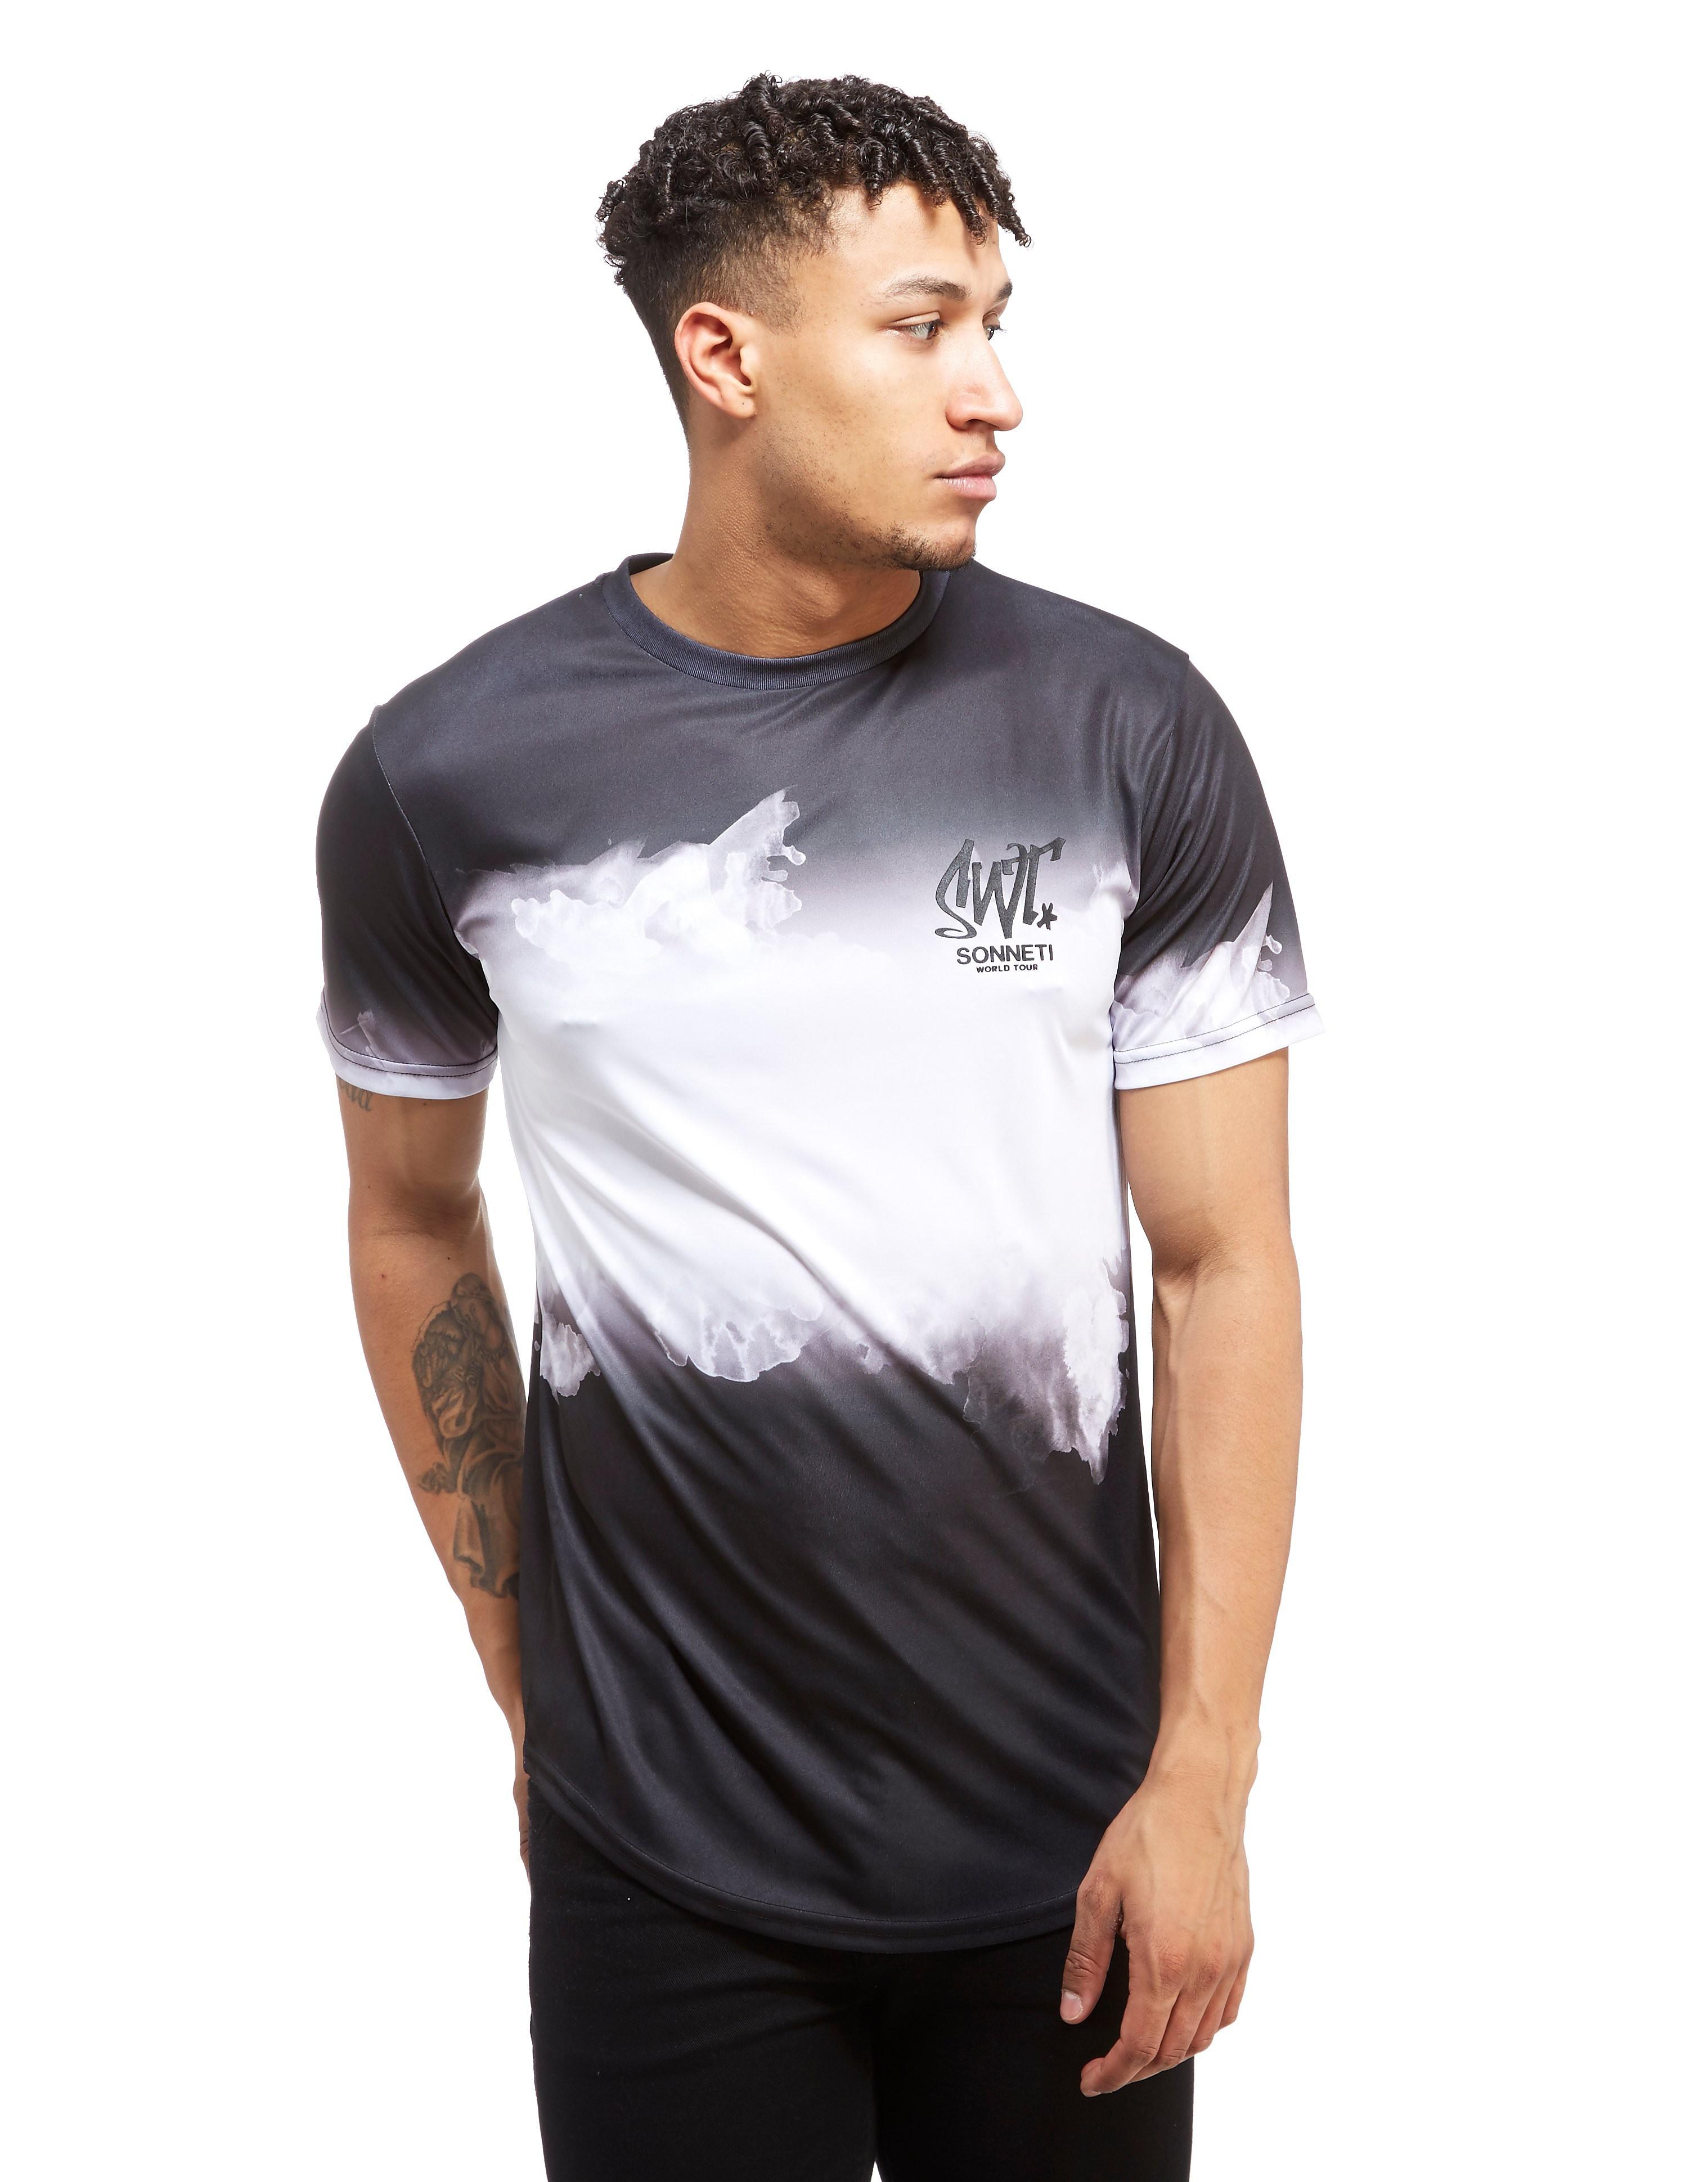 Sonneti Clouded T-Shirt